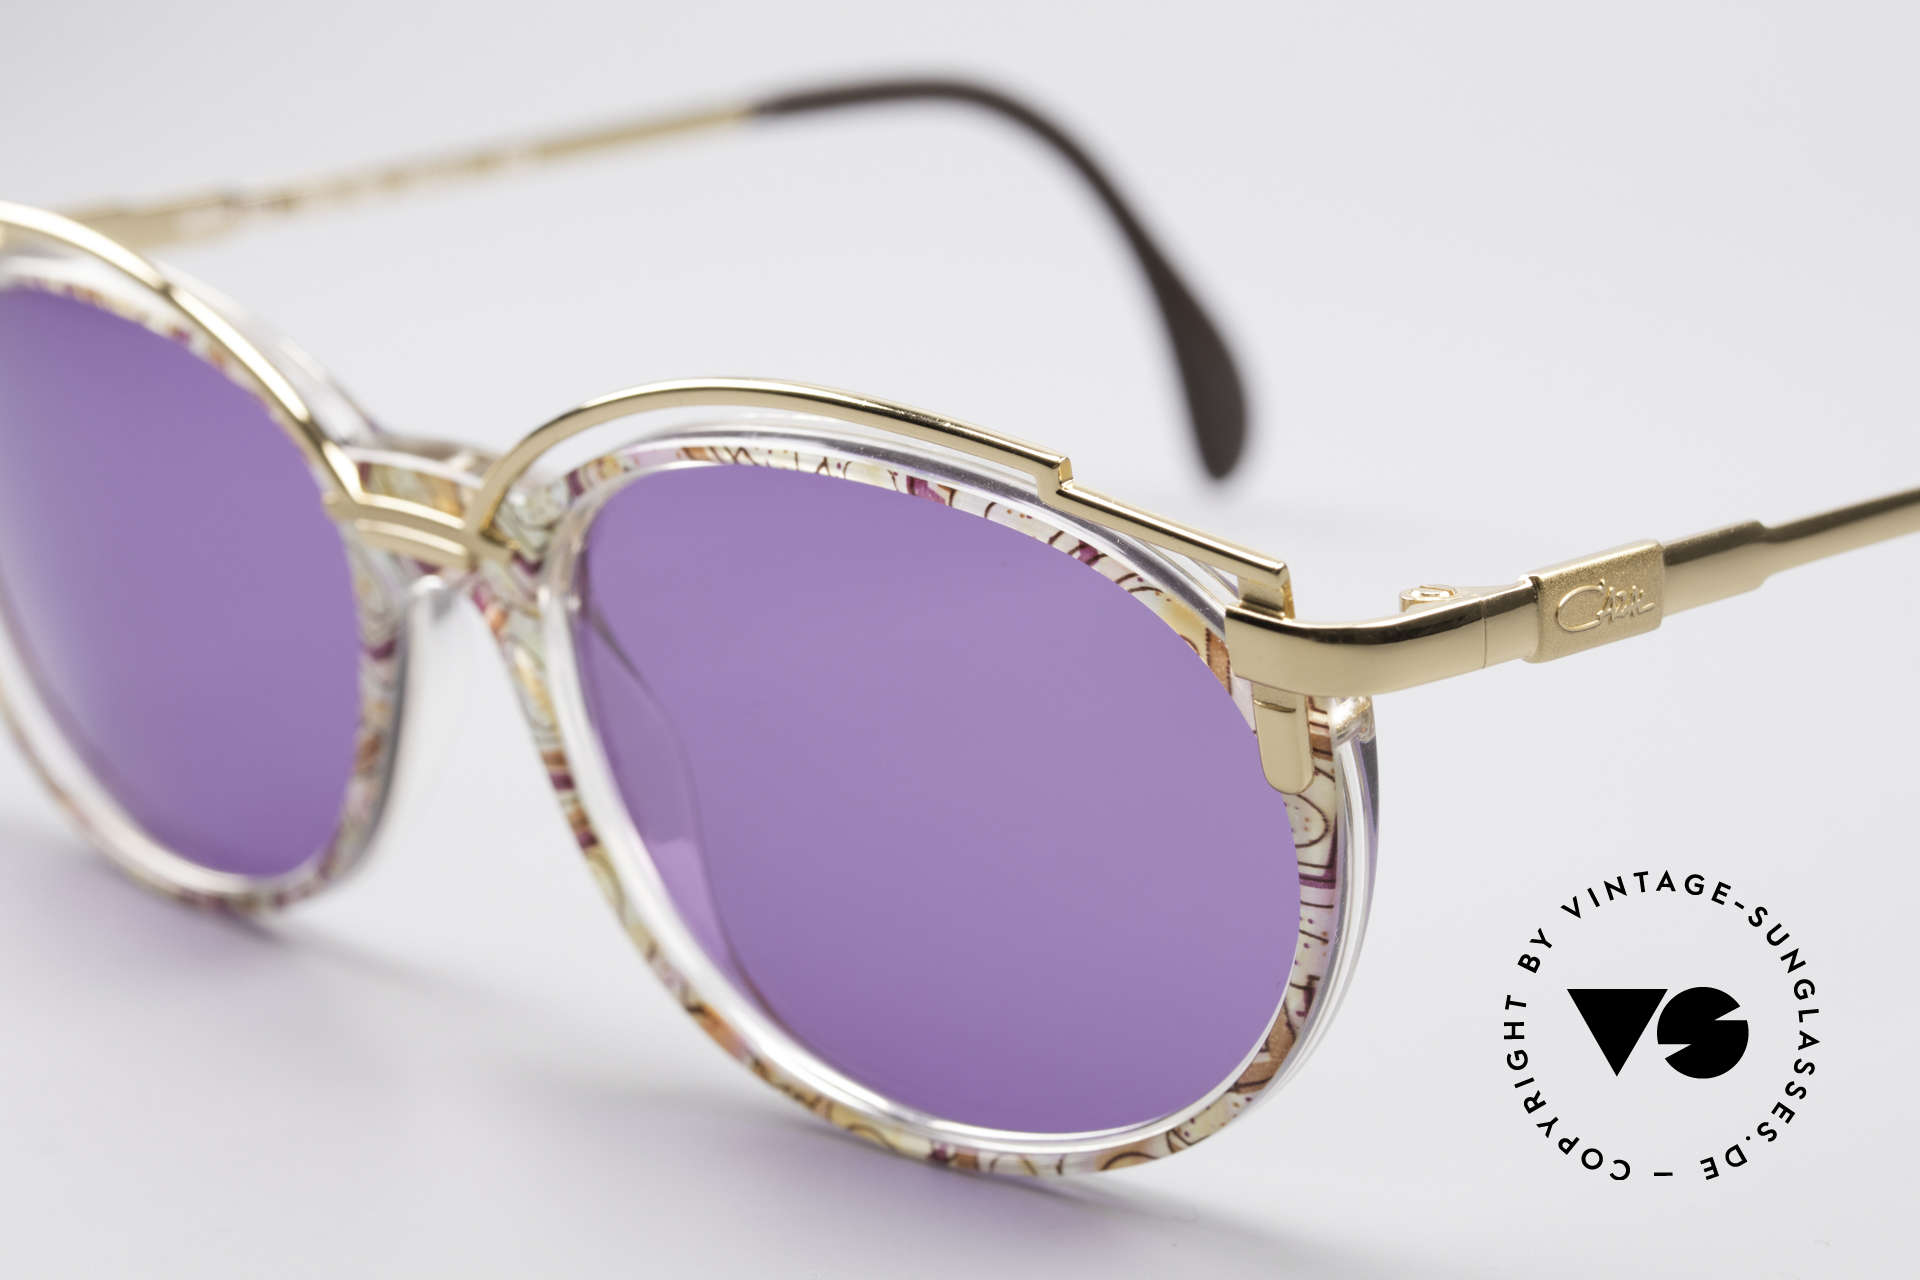 Cazal 358 Rare 90er Vintage Sonnenbrille, grandioses Rahmenmuster: fuchsia-mint pastell / gold, Passend für Damen